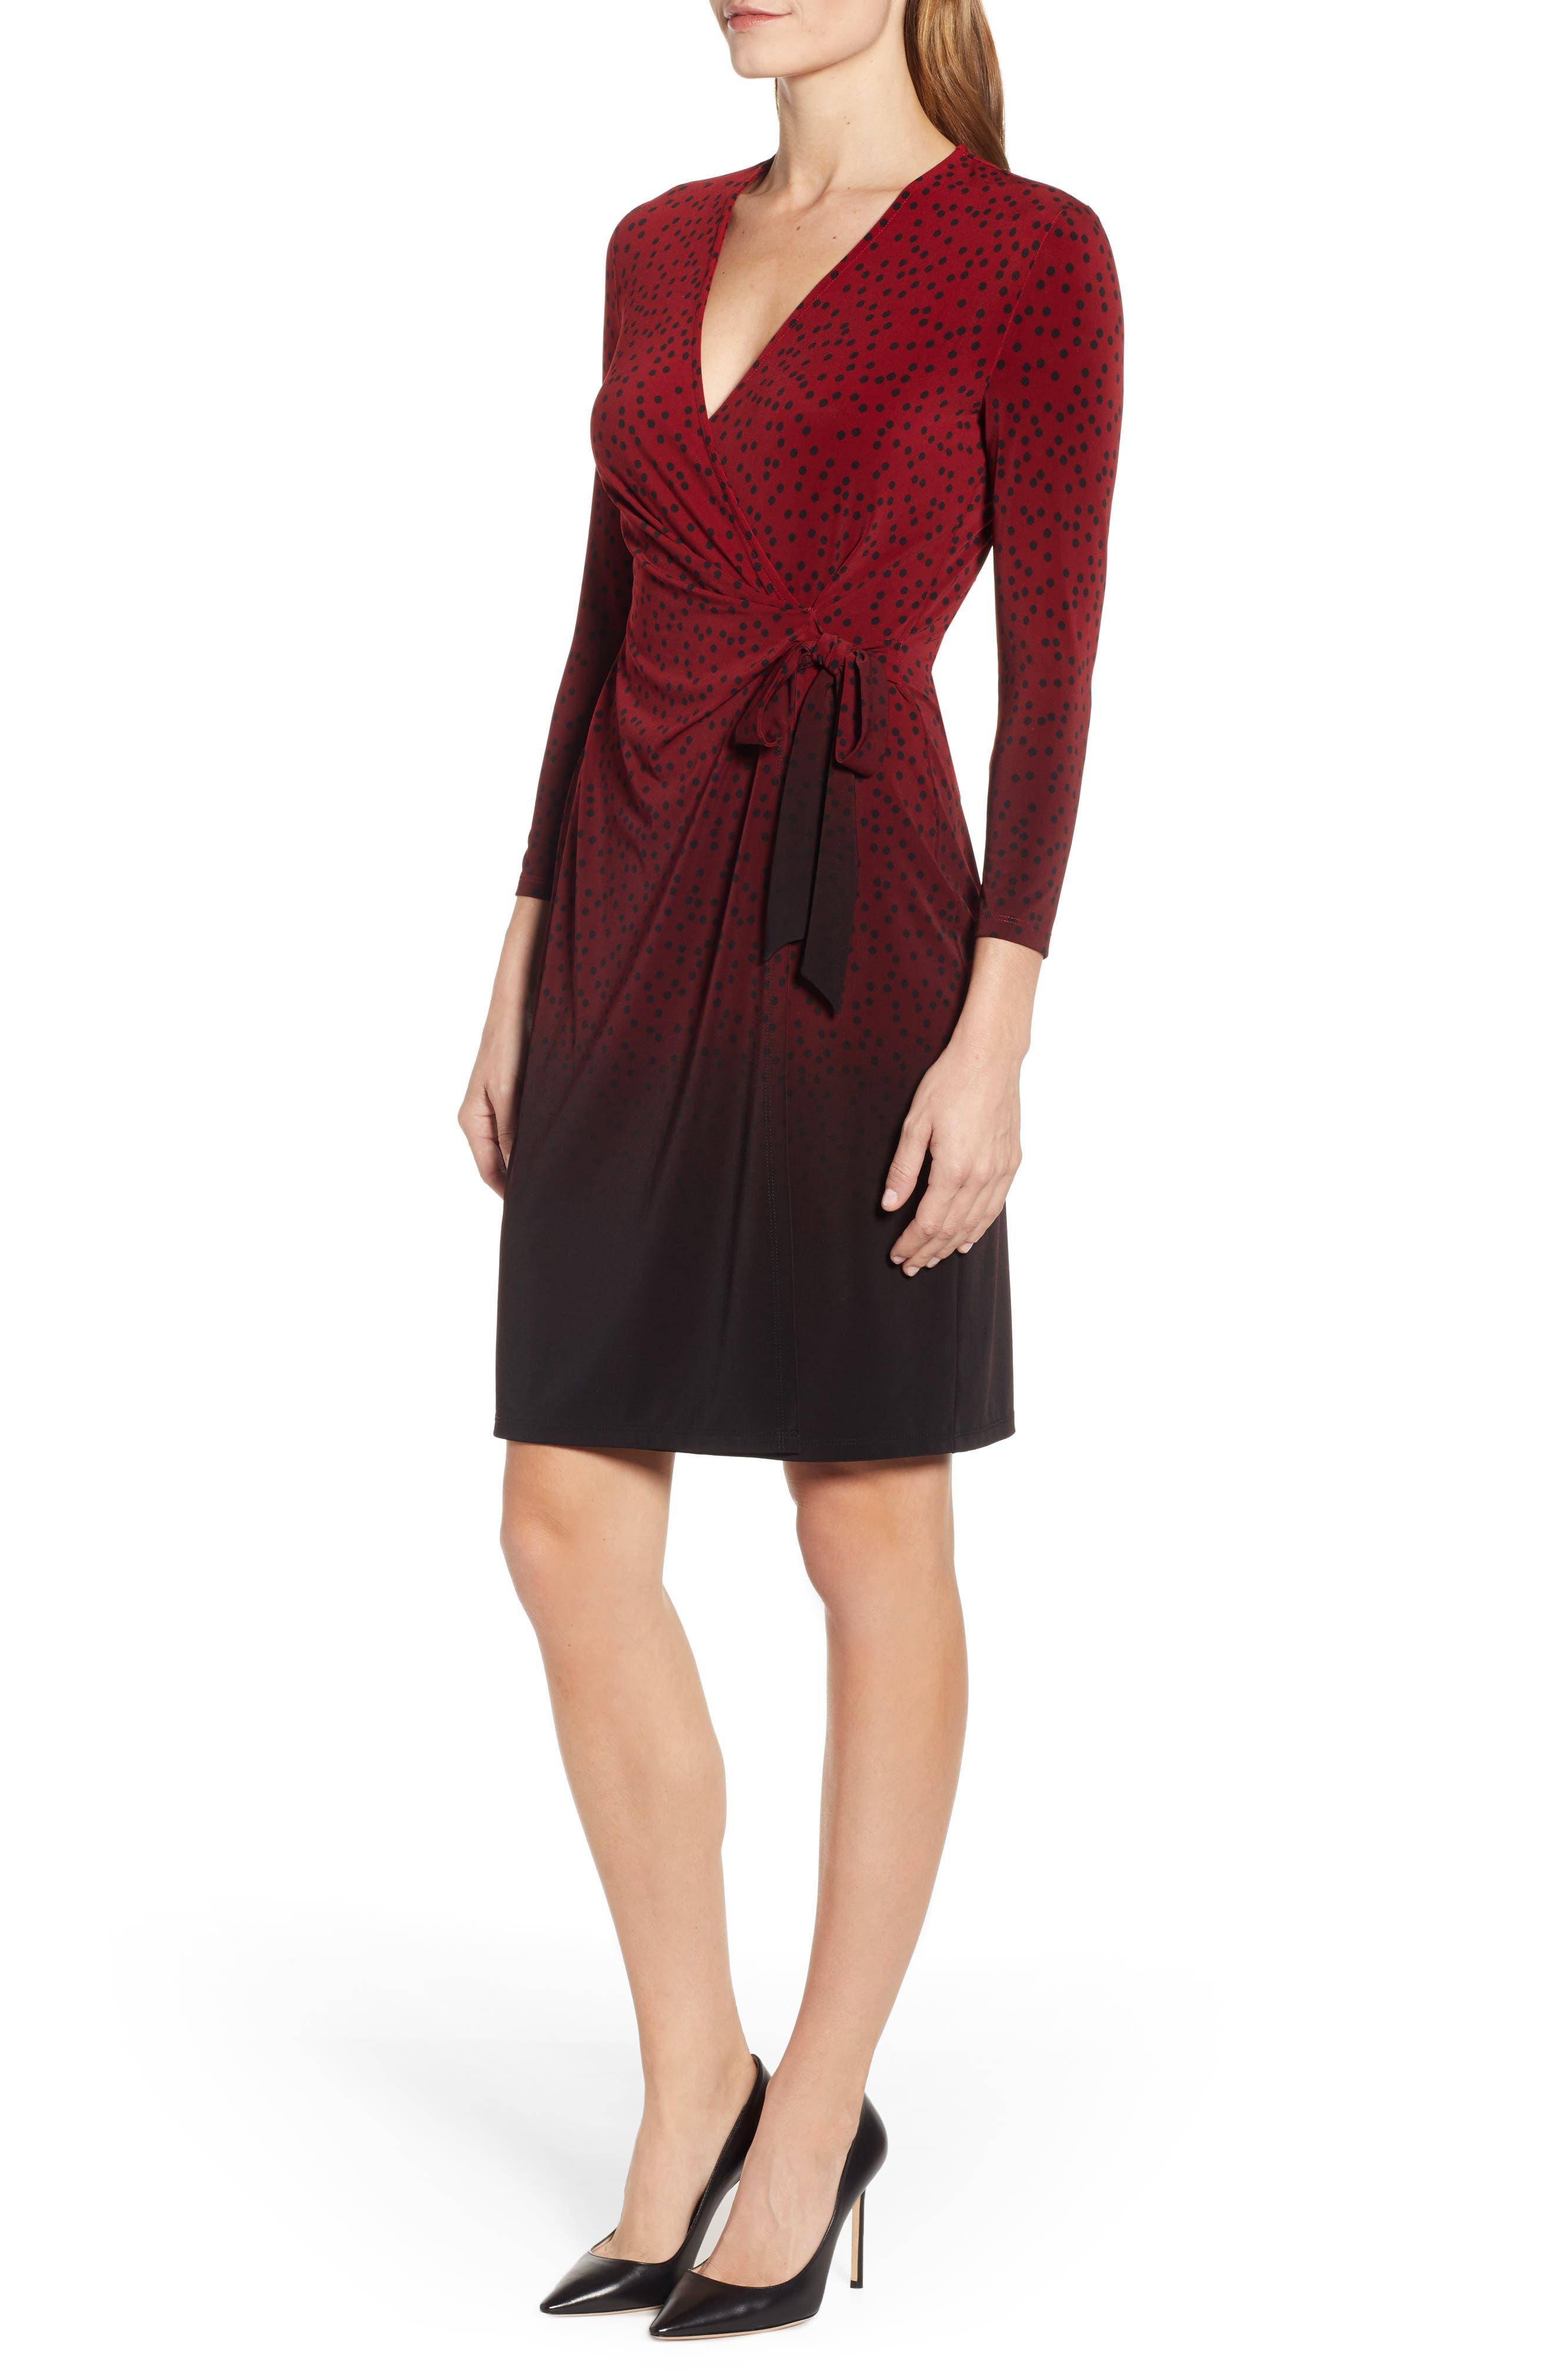 ANNE KLEIN,                             Camille Dot Faux Wrap Dress,                             Alternate thumbnail 3, color,                             DK TITIAN RED/ ANNE BLK COMBO